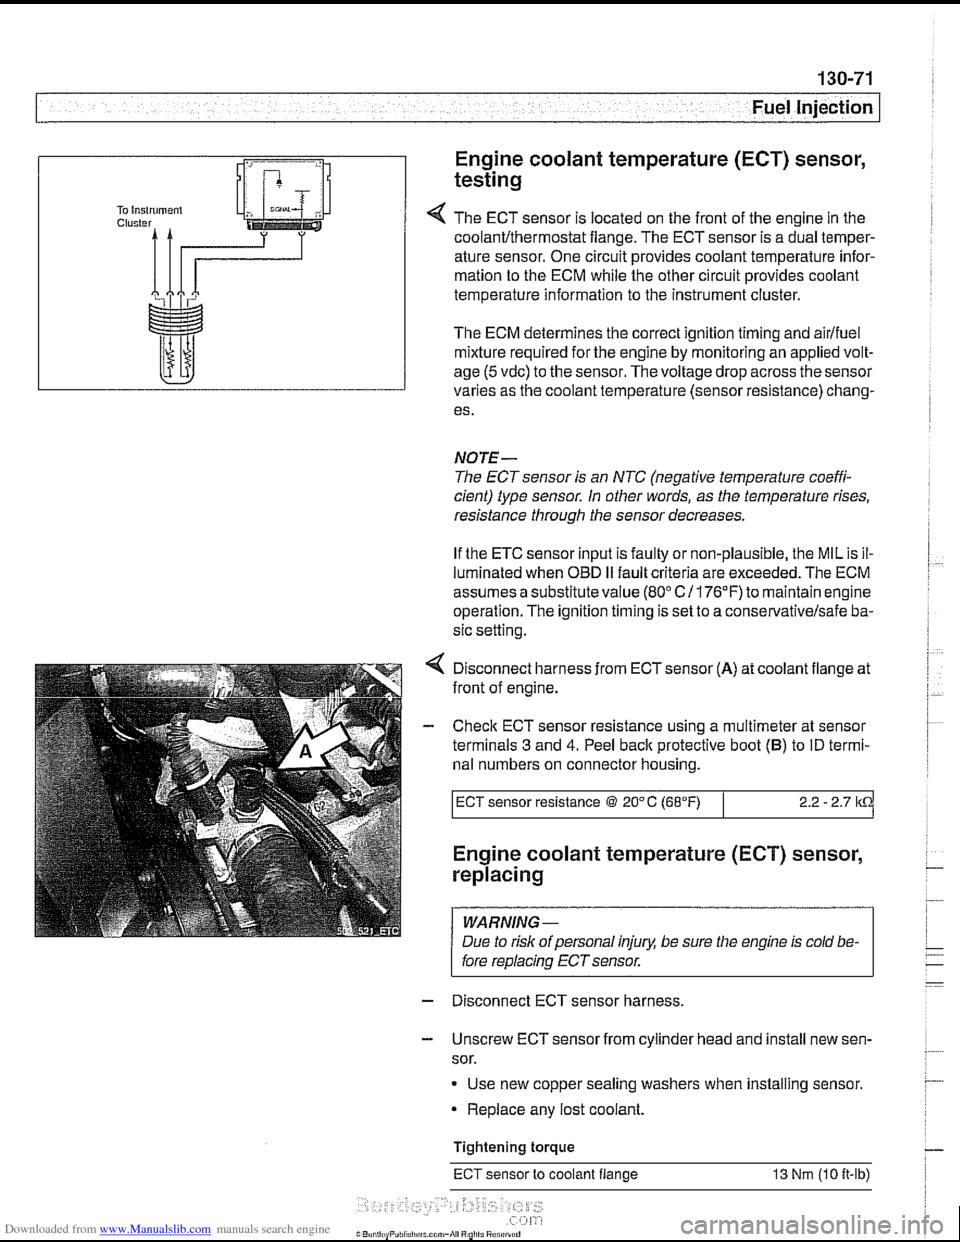 Bmw 540i 1997 E39 Workshop Manual 528i Wiring Harness